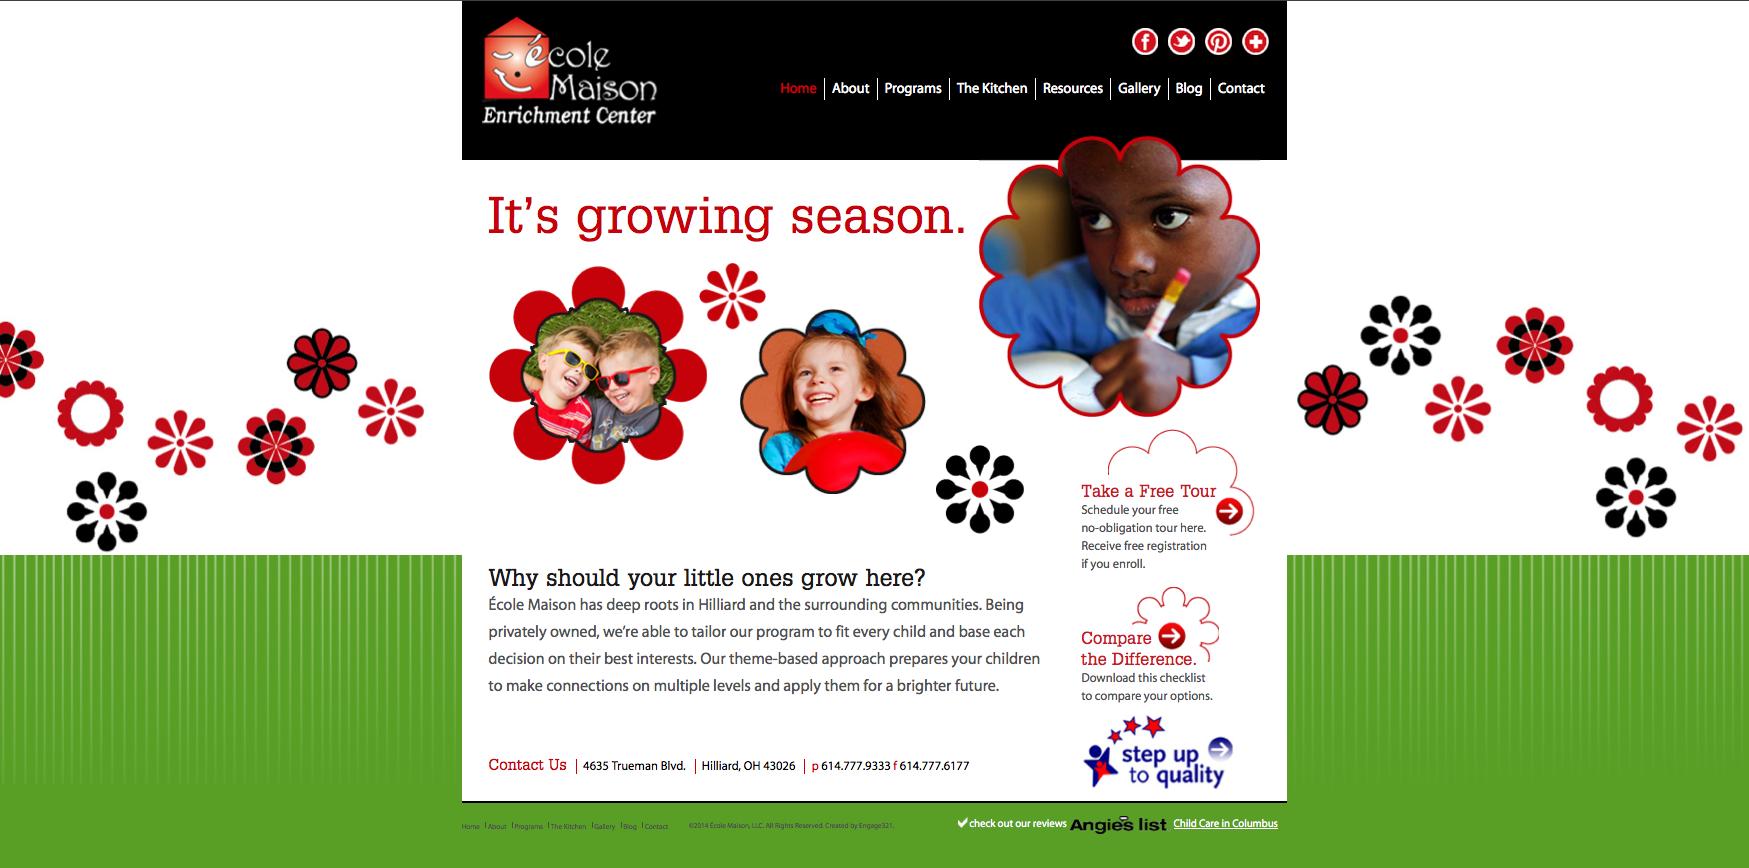 Ecole Maison Website Home Page